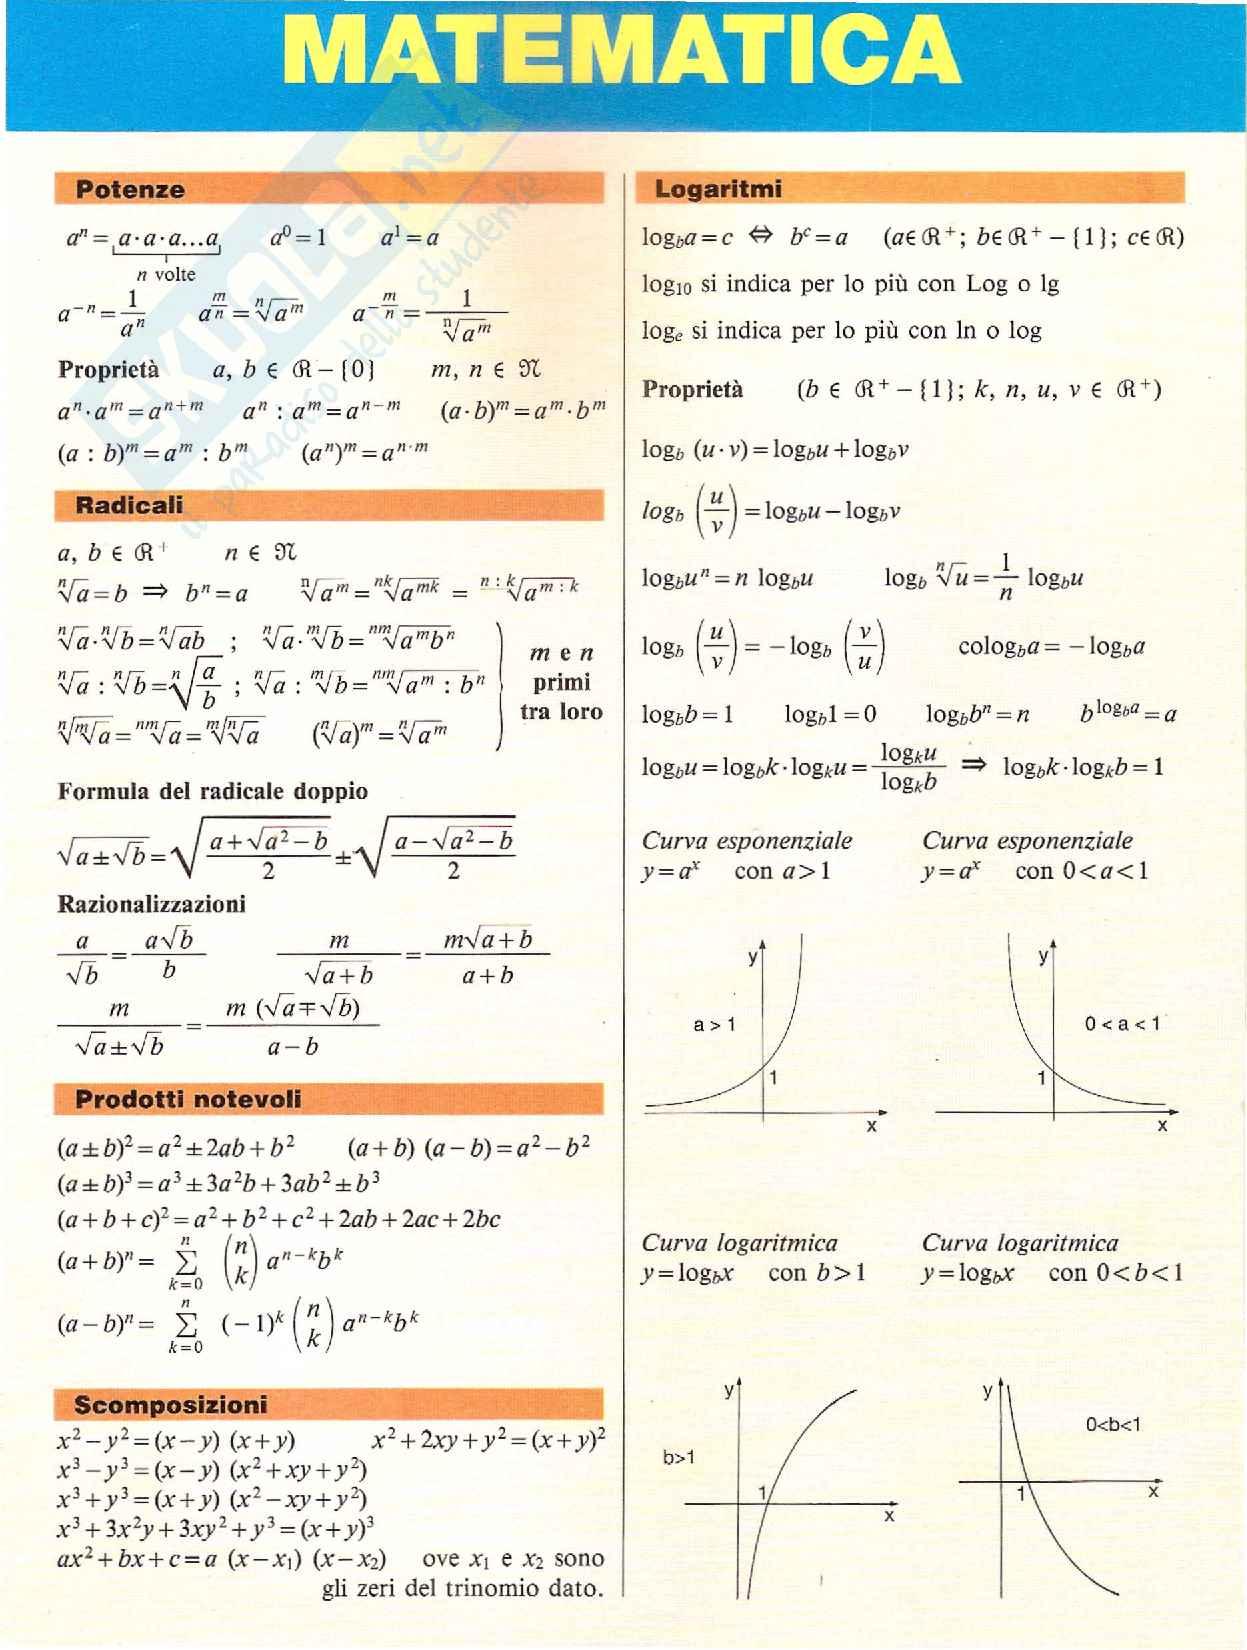 Matematica tutte le formule